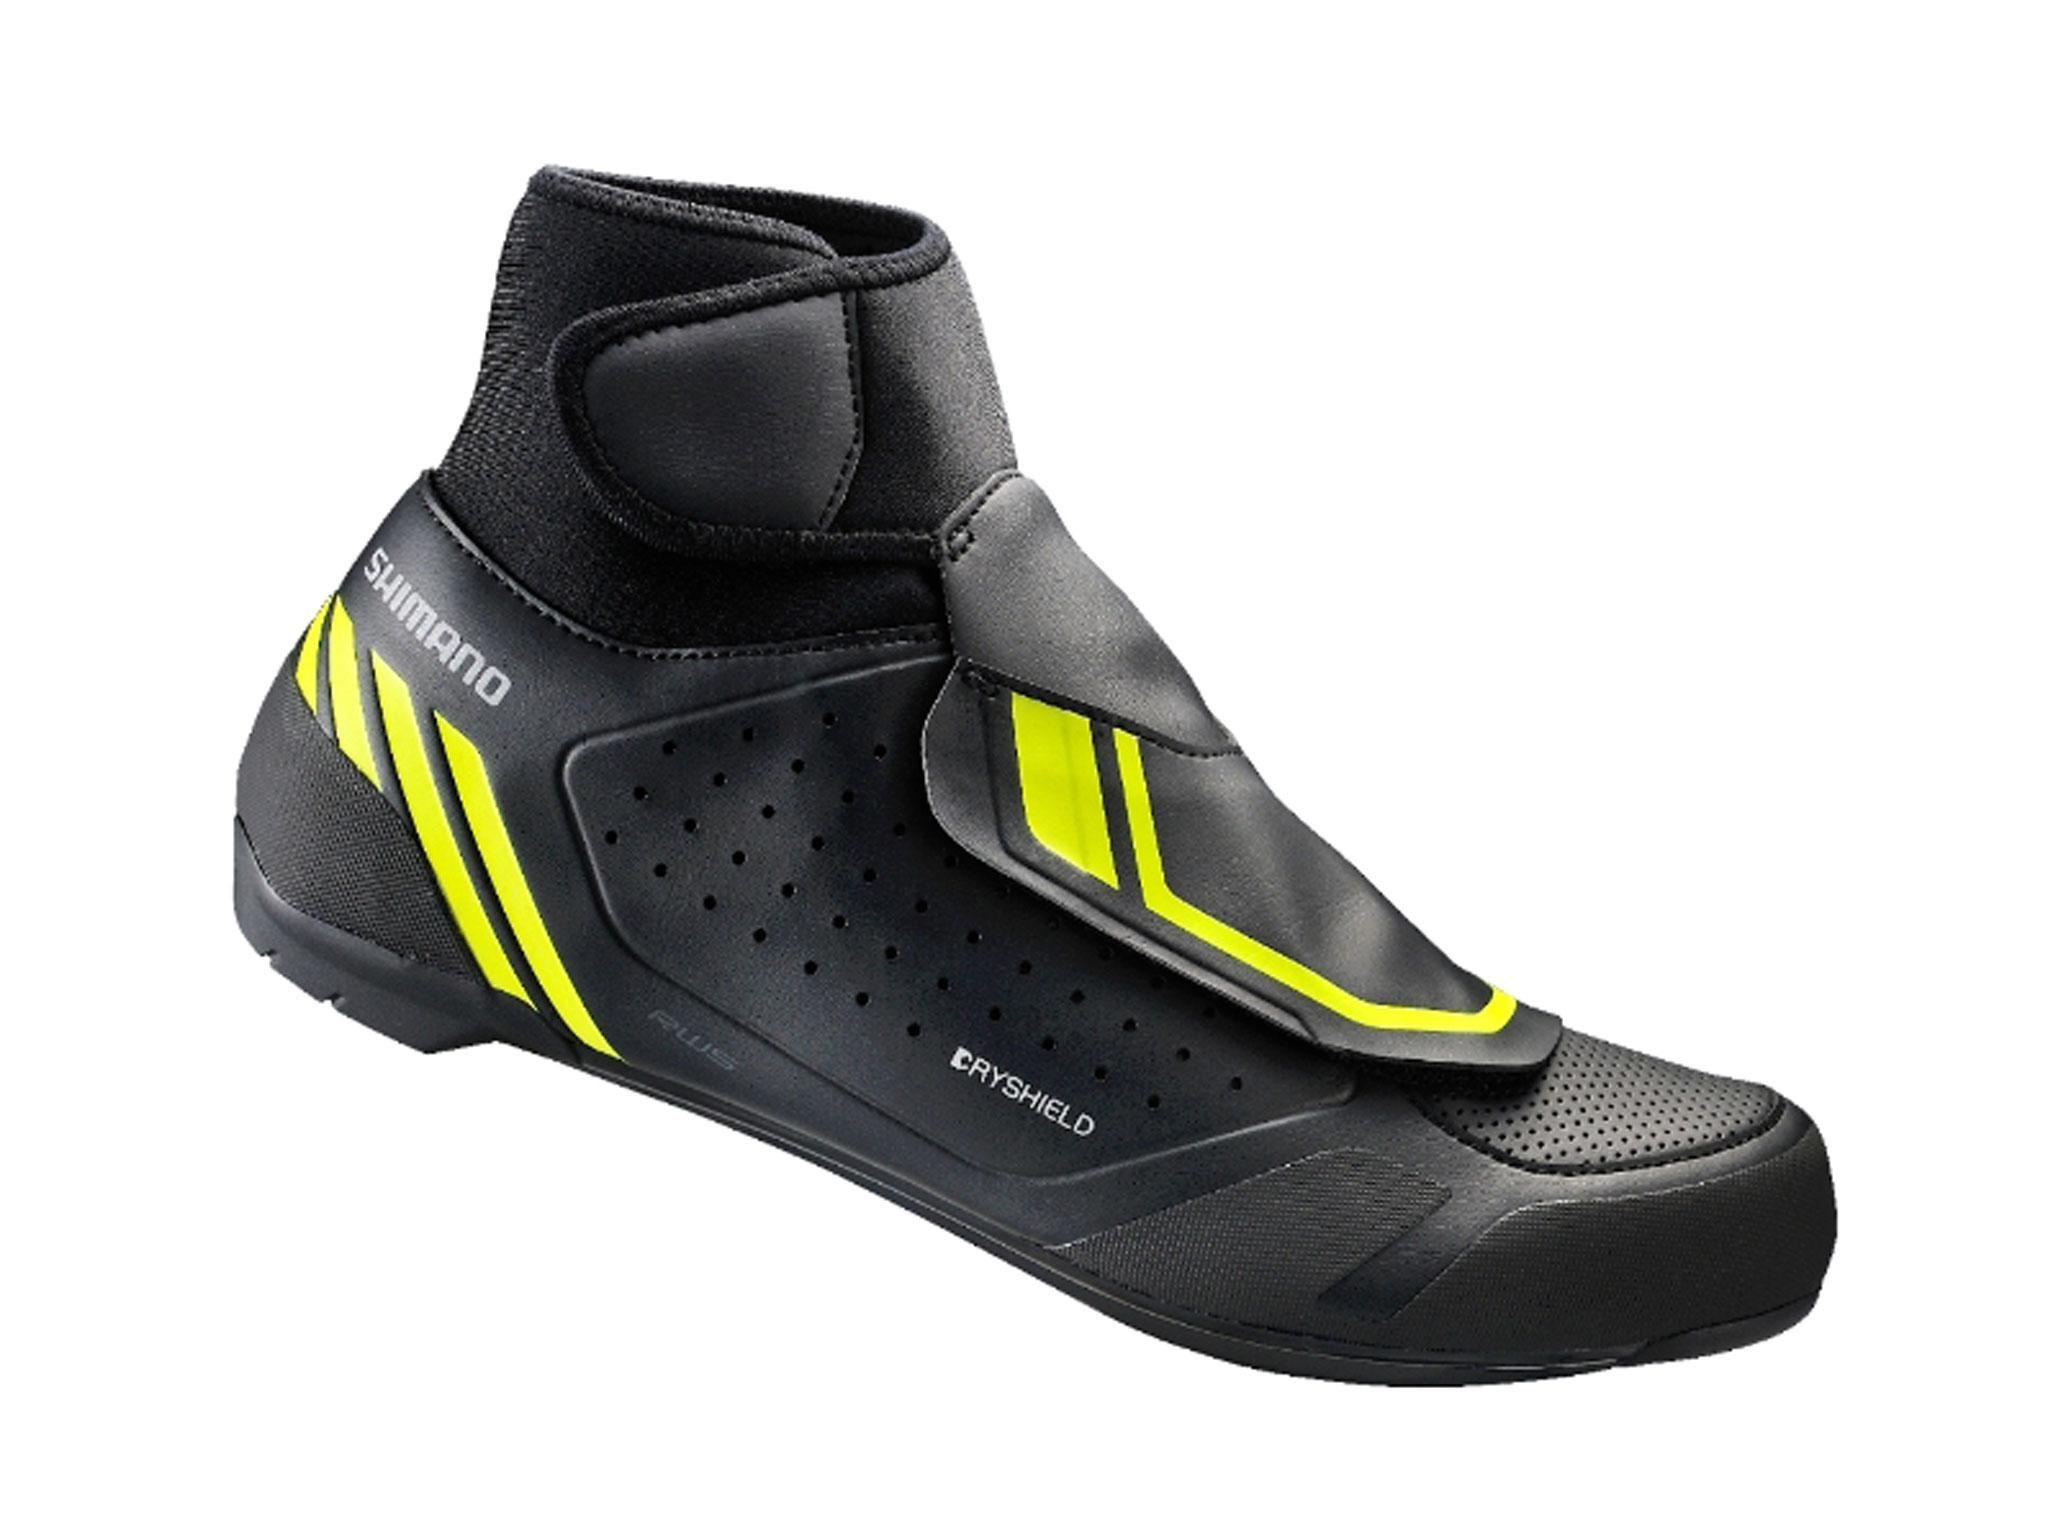 Shimano RW5 Dryshield Winter Cycling Road Shoes